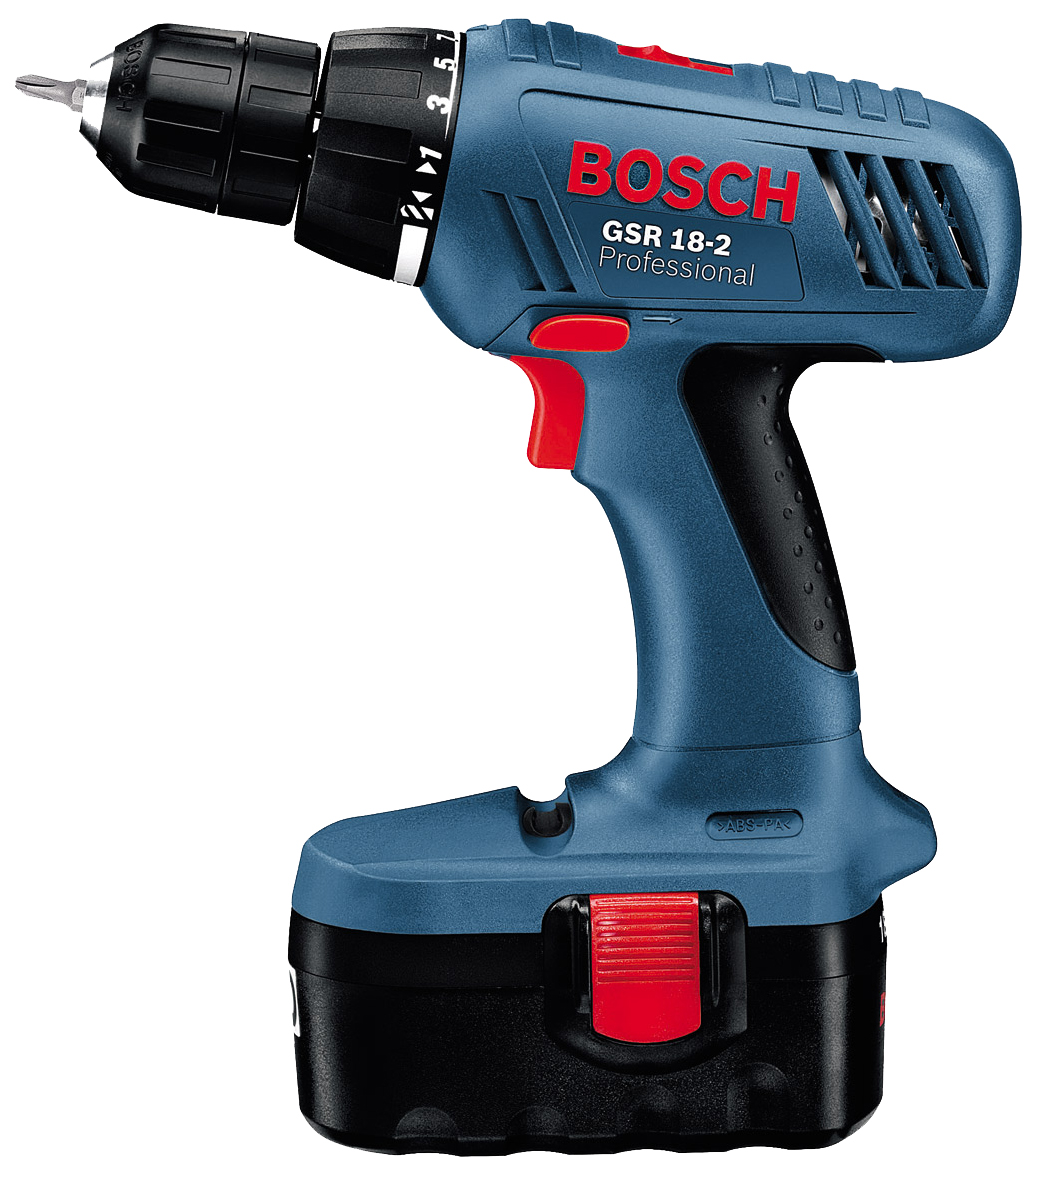 Аккумуляторная дрель-шуруповерт Bosch GSR 18-2 1,5 Ач 601918300